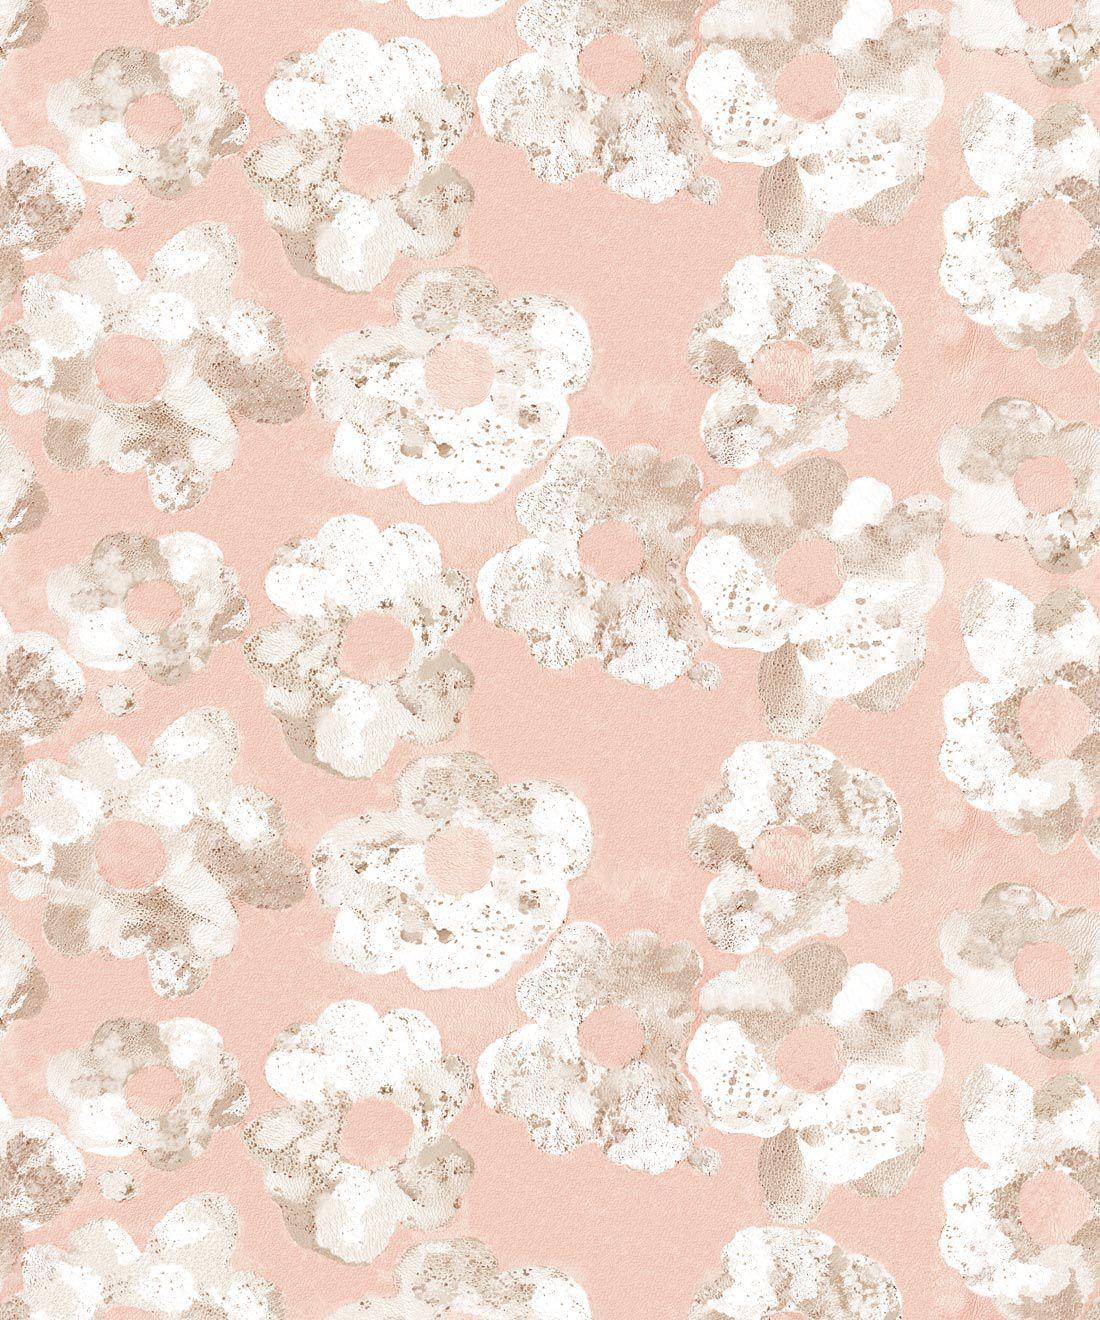 Cherry Blossom Wallpaper Blush • Shibori Floral • Swatch